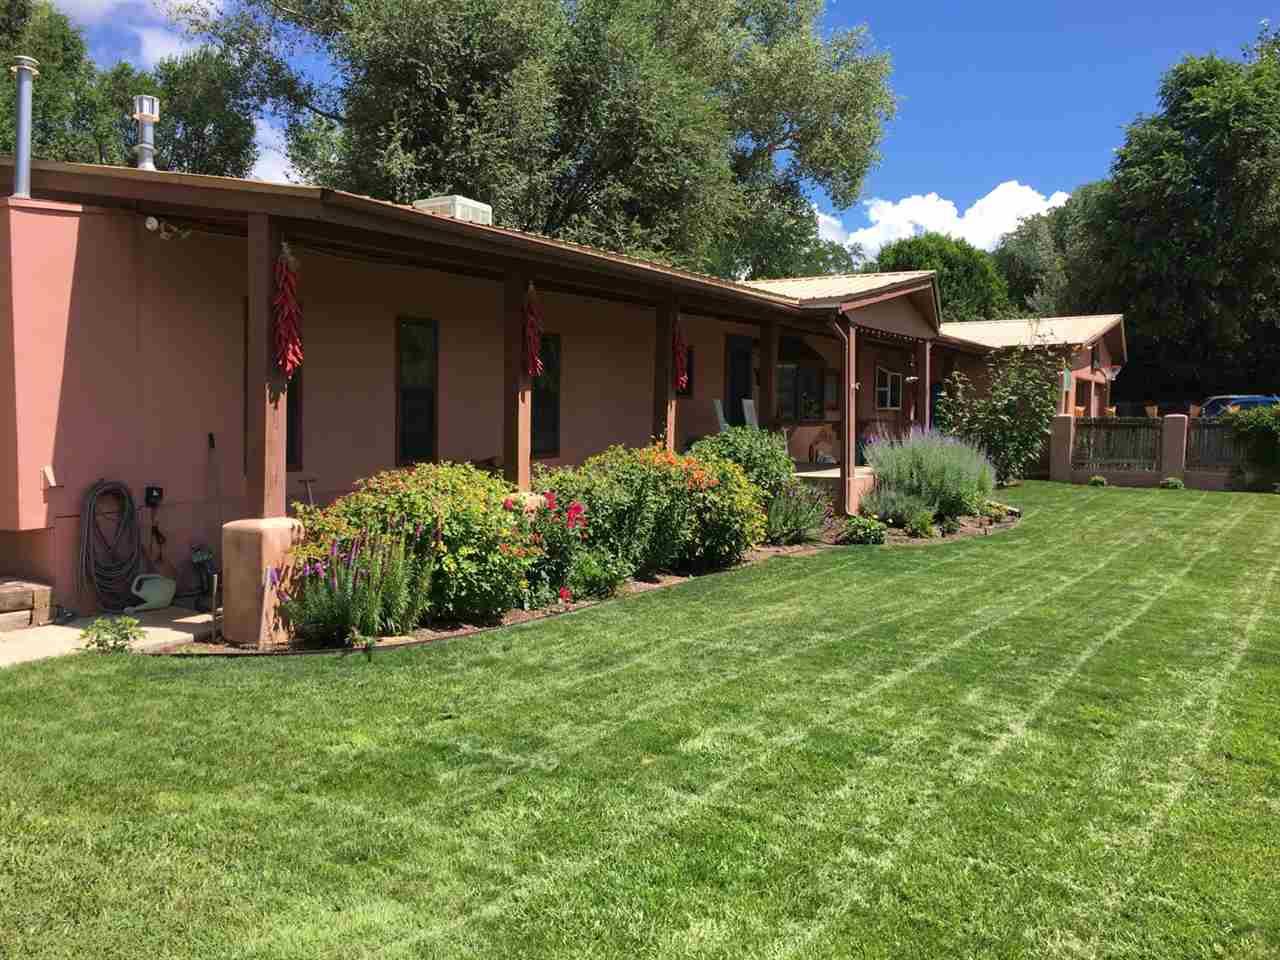 503 Ranchitos Rd., Taos, NM 87571